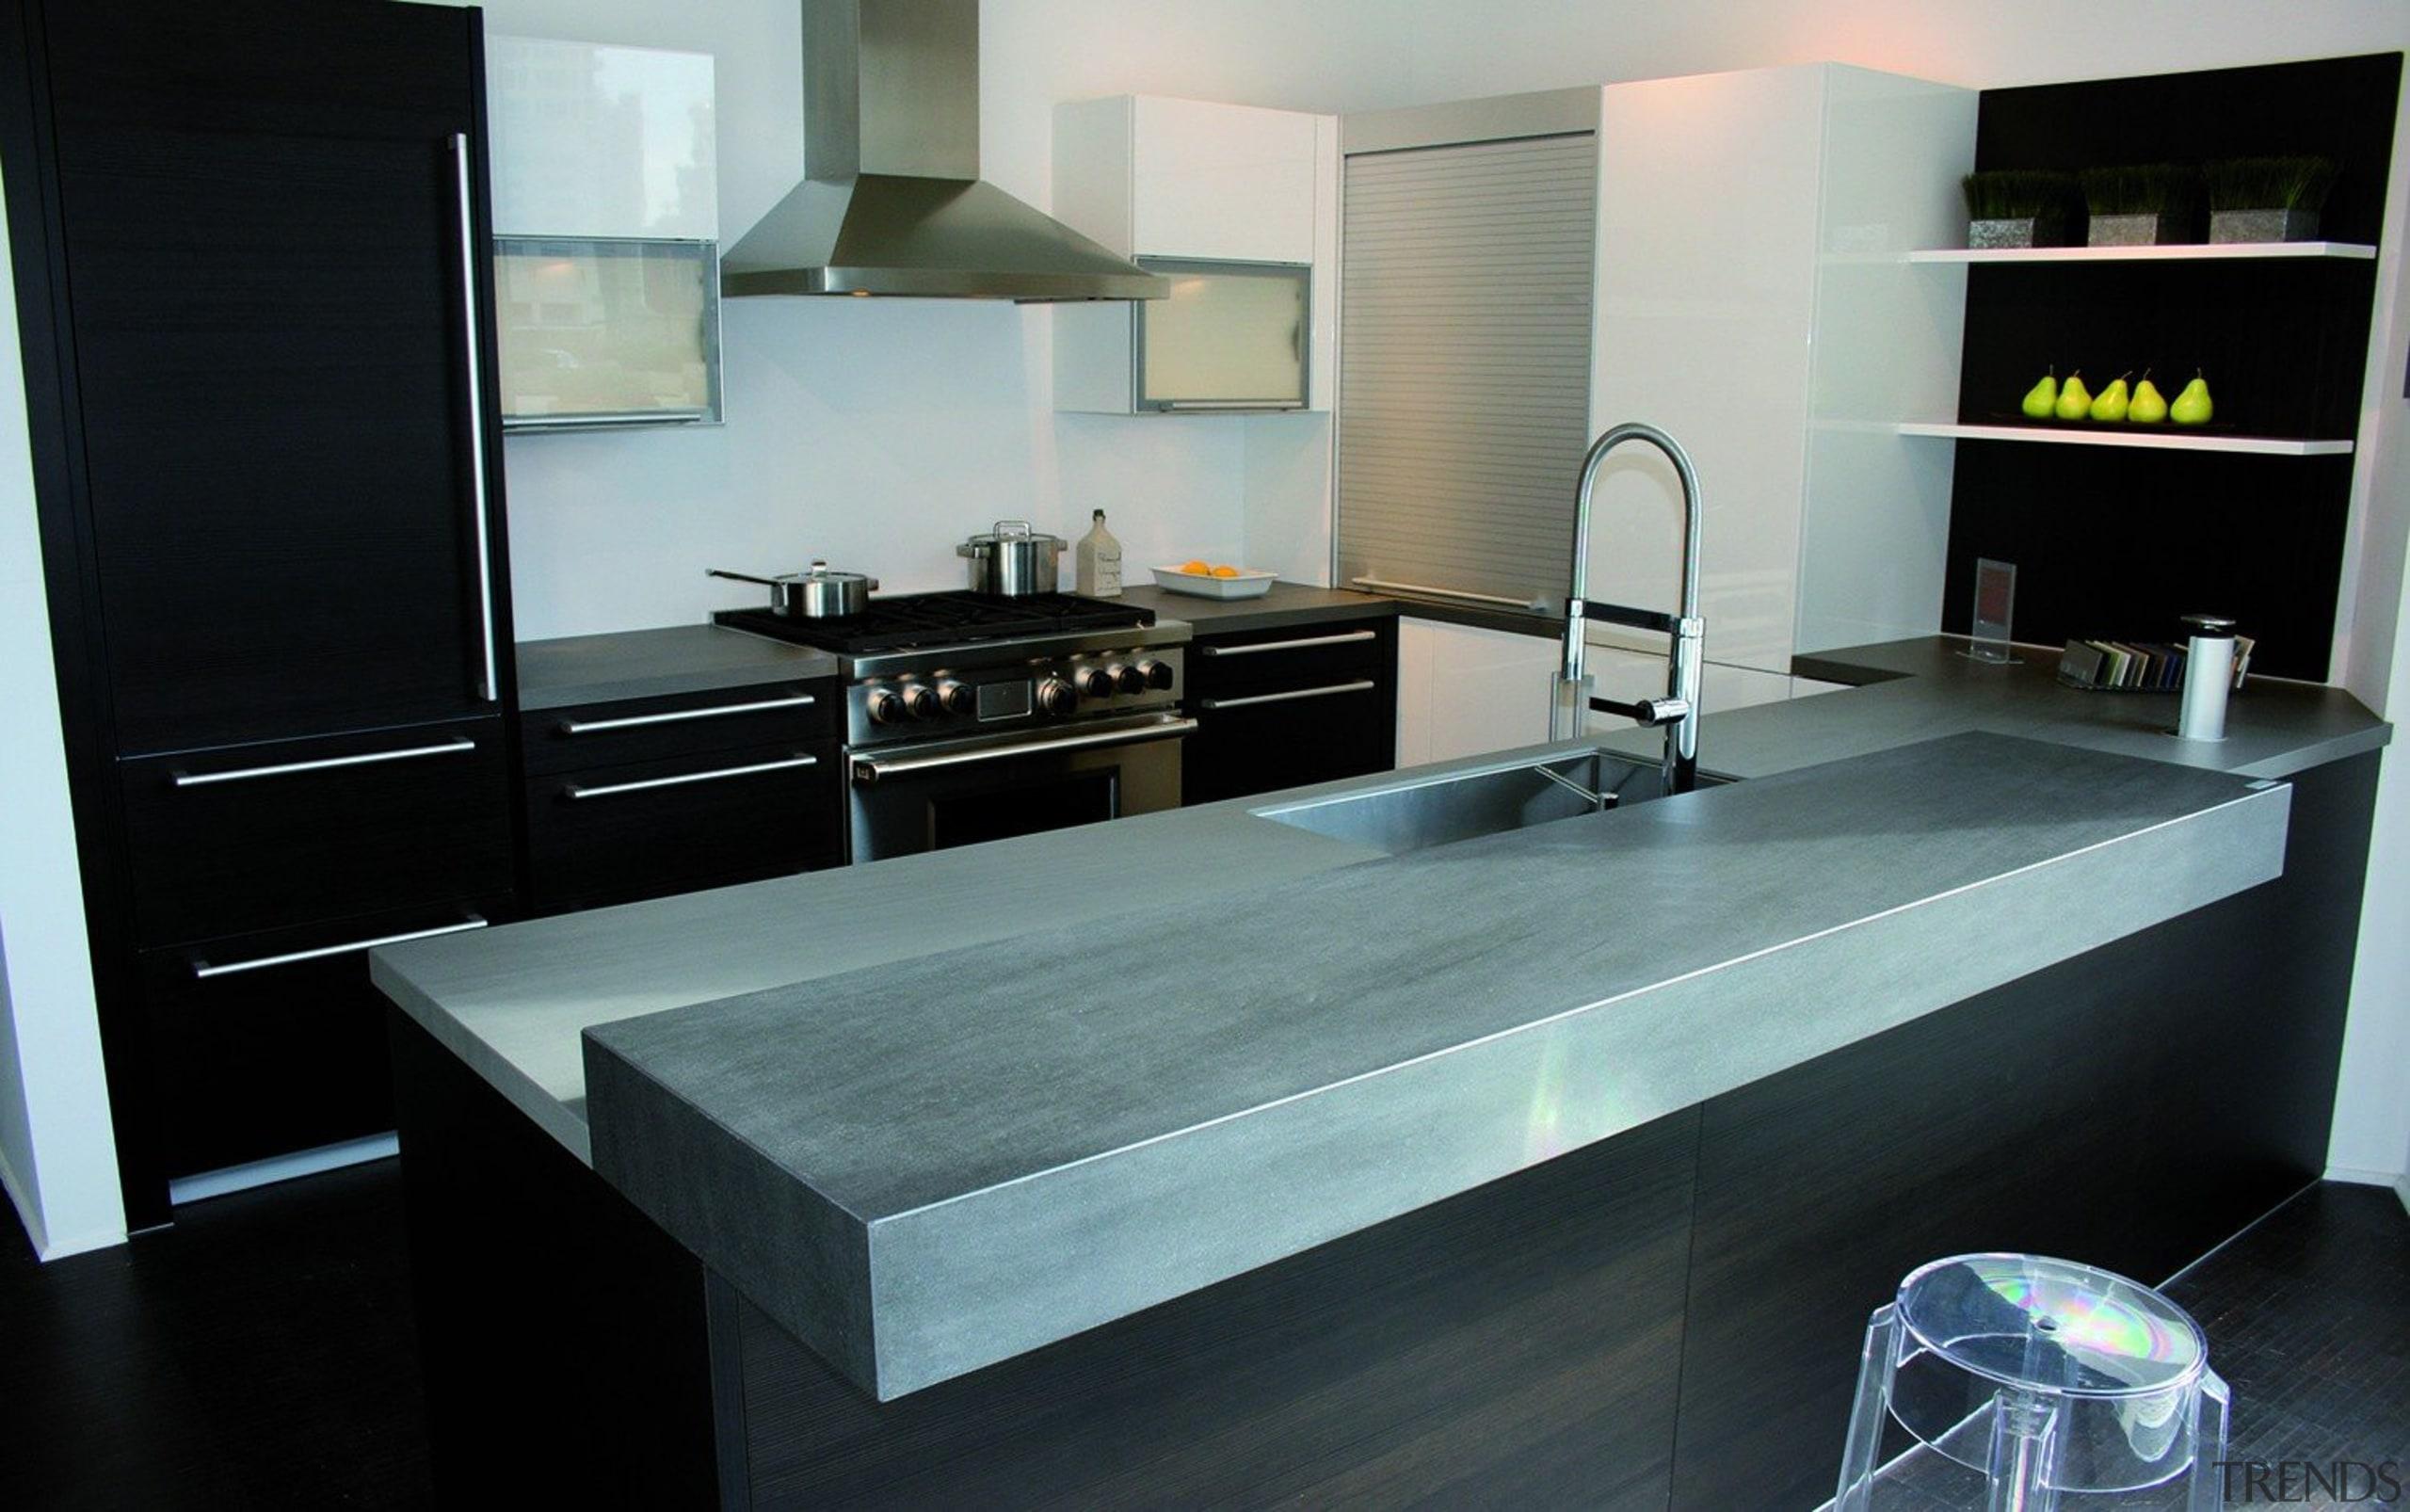 Basalt Grey - Basalt Grey - countertop | countertop, floor, interior design, kitchen, product design, room, black, gray